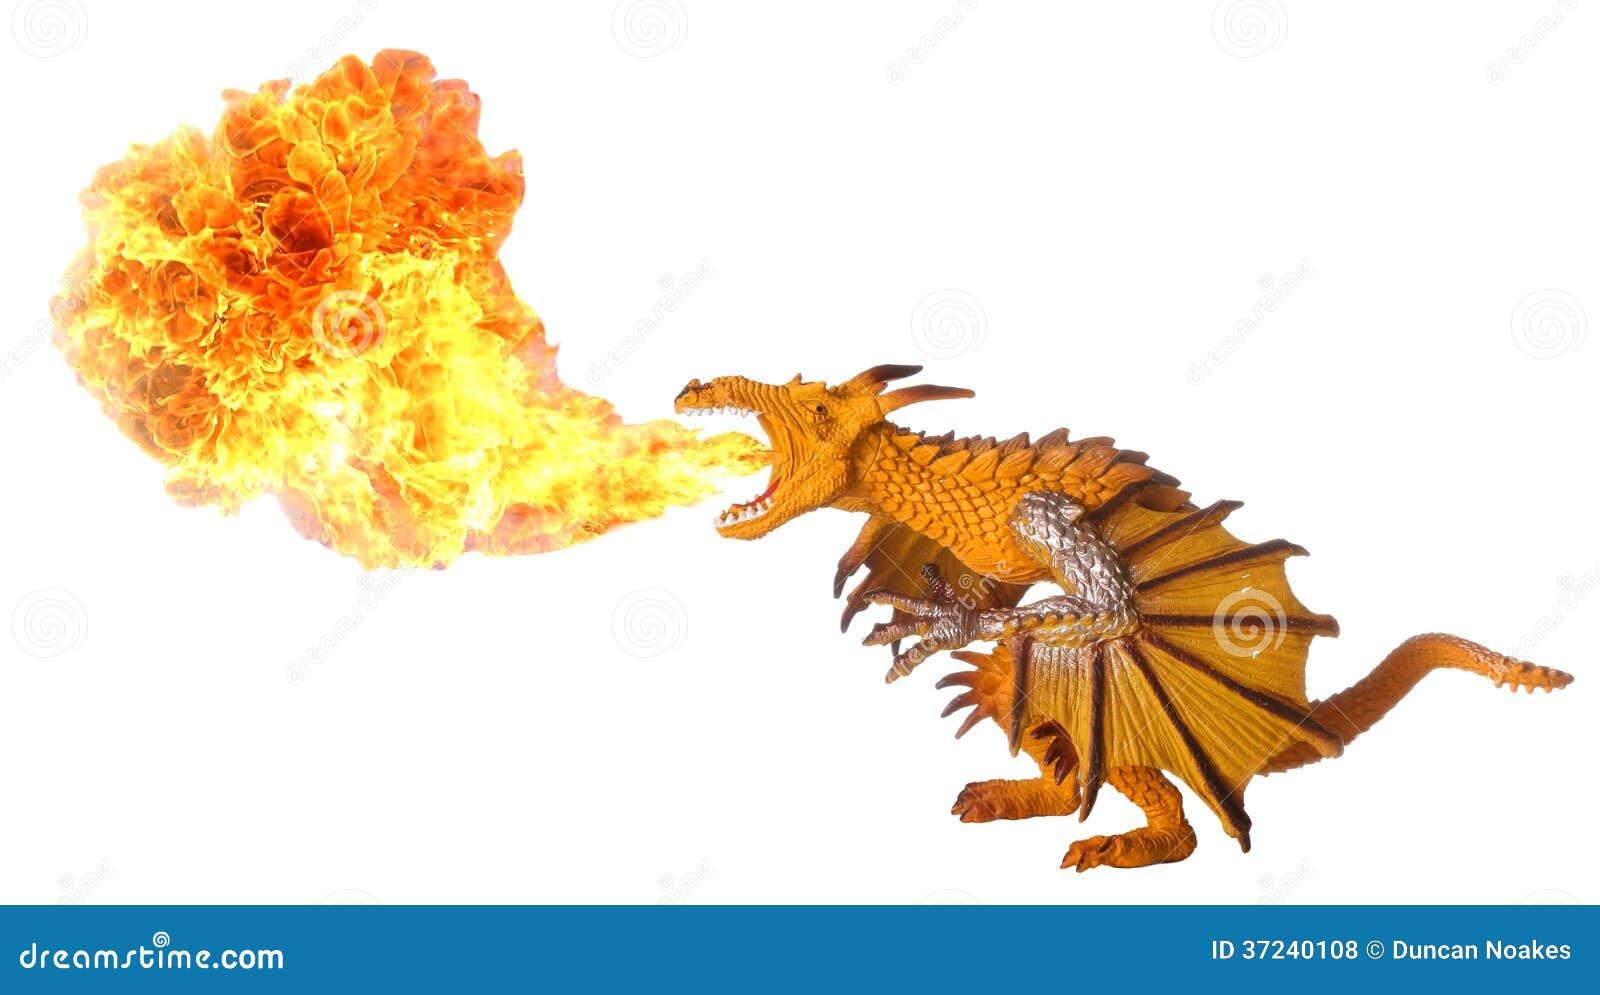 Dragon Fire Breath Royalty Free Stock Photos Image 37240108